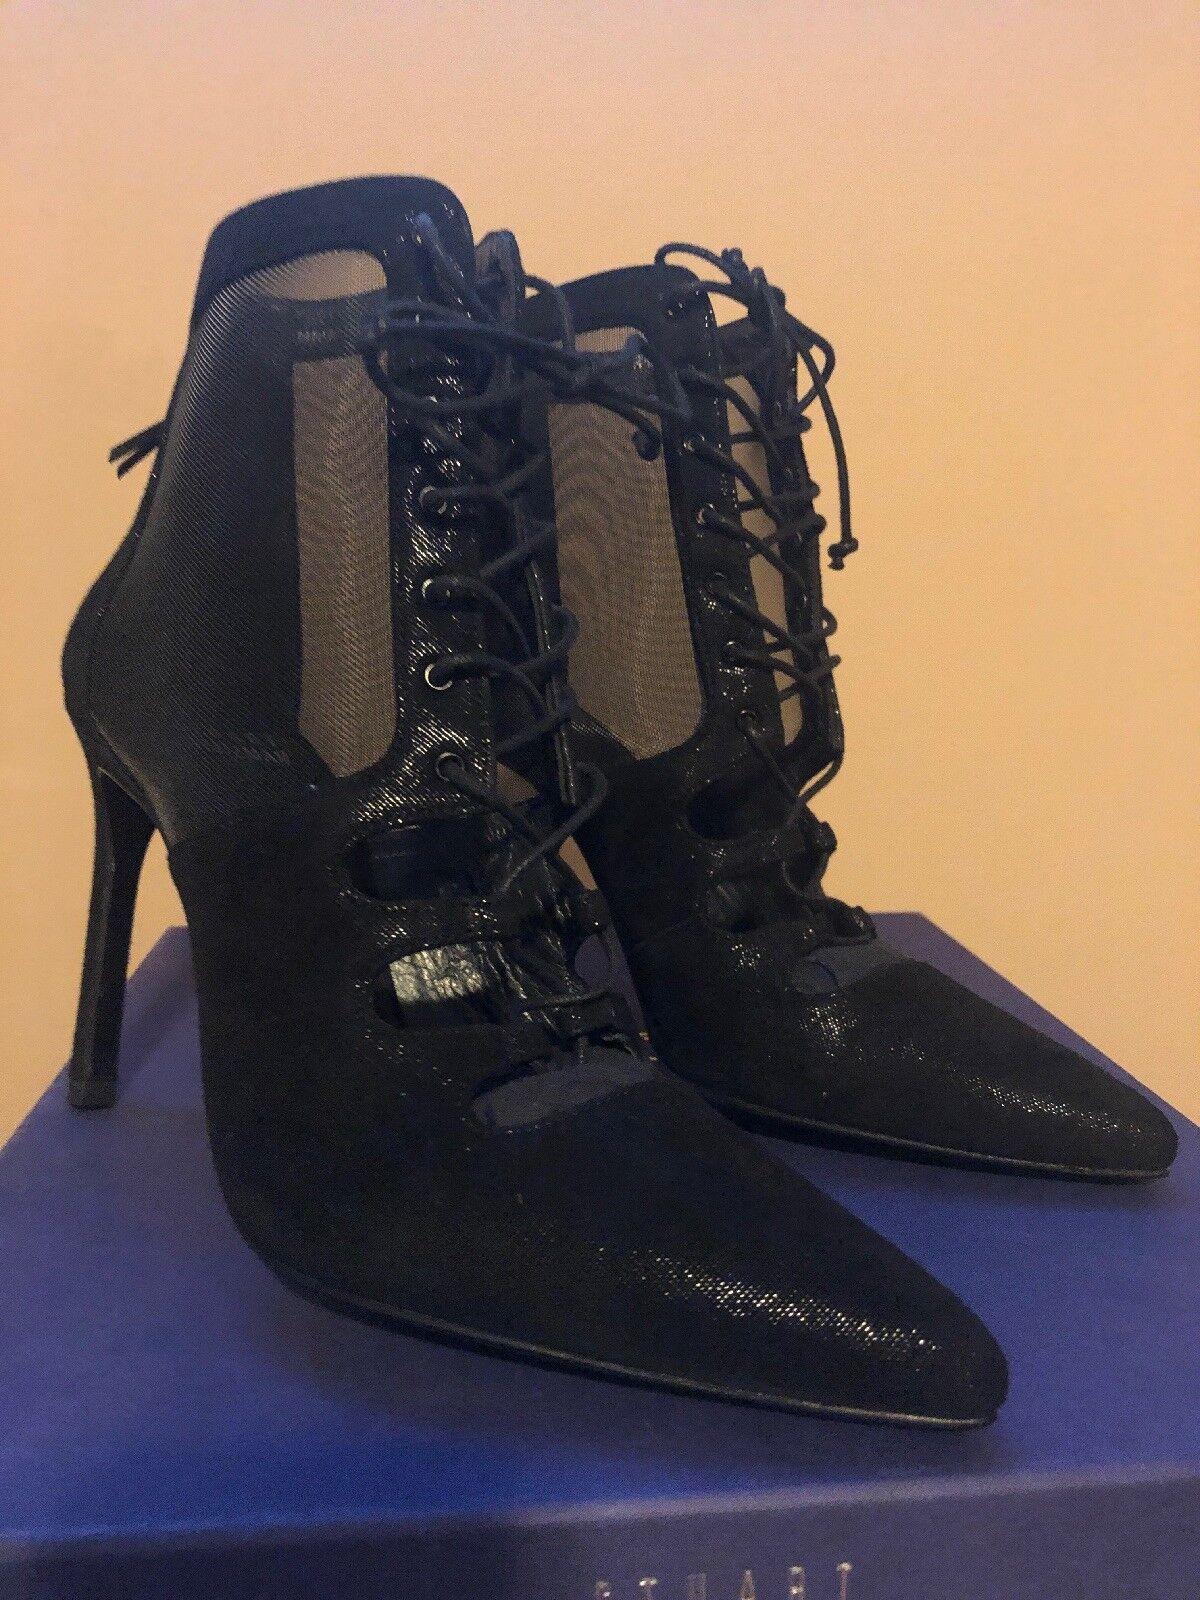 in vendita Stuart Weitzman nero Suede Mesh Donna    High Heels Pointed Toe scarpe Dimensione 6.5  scelta migliore